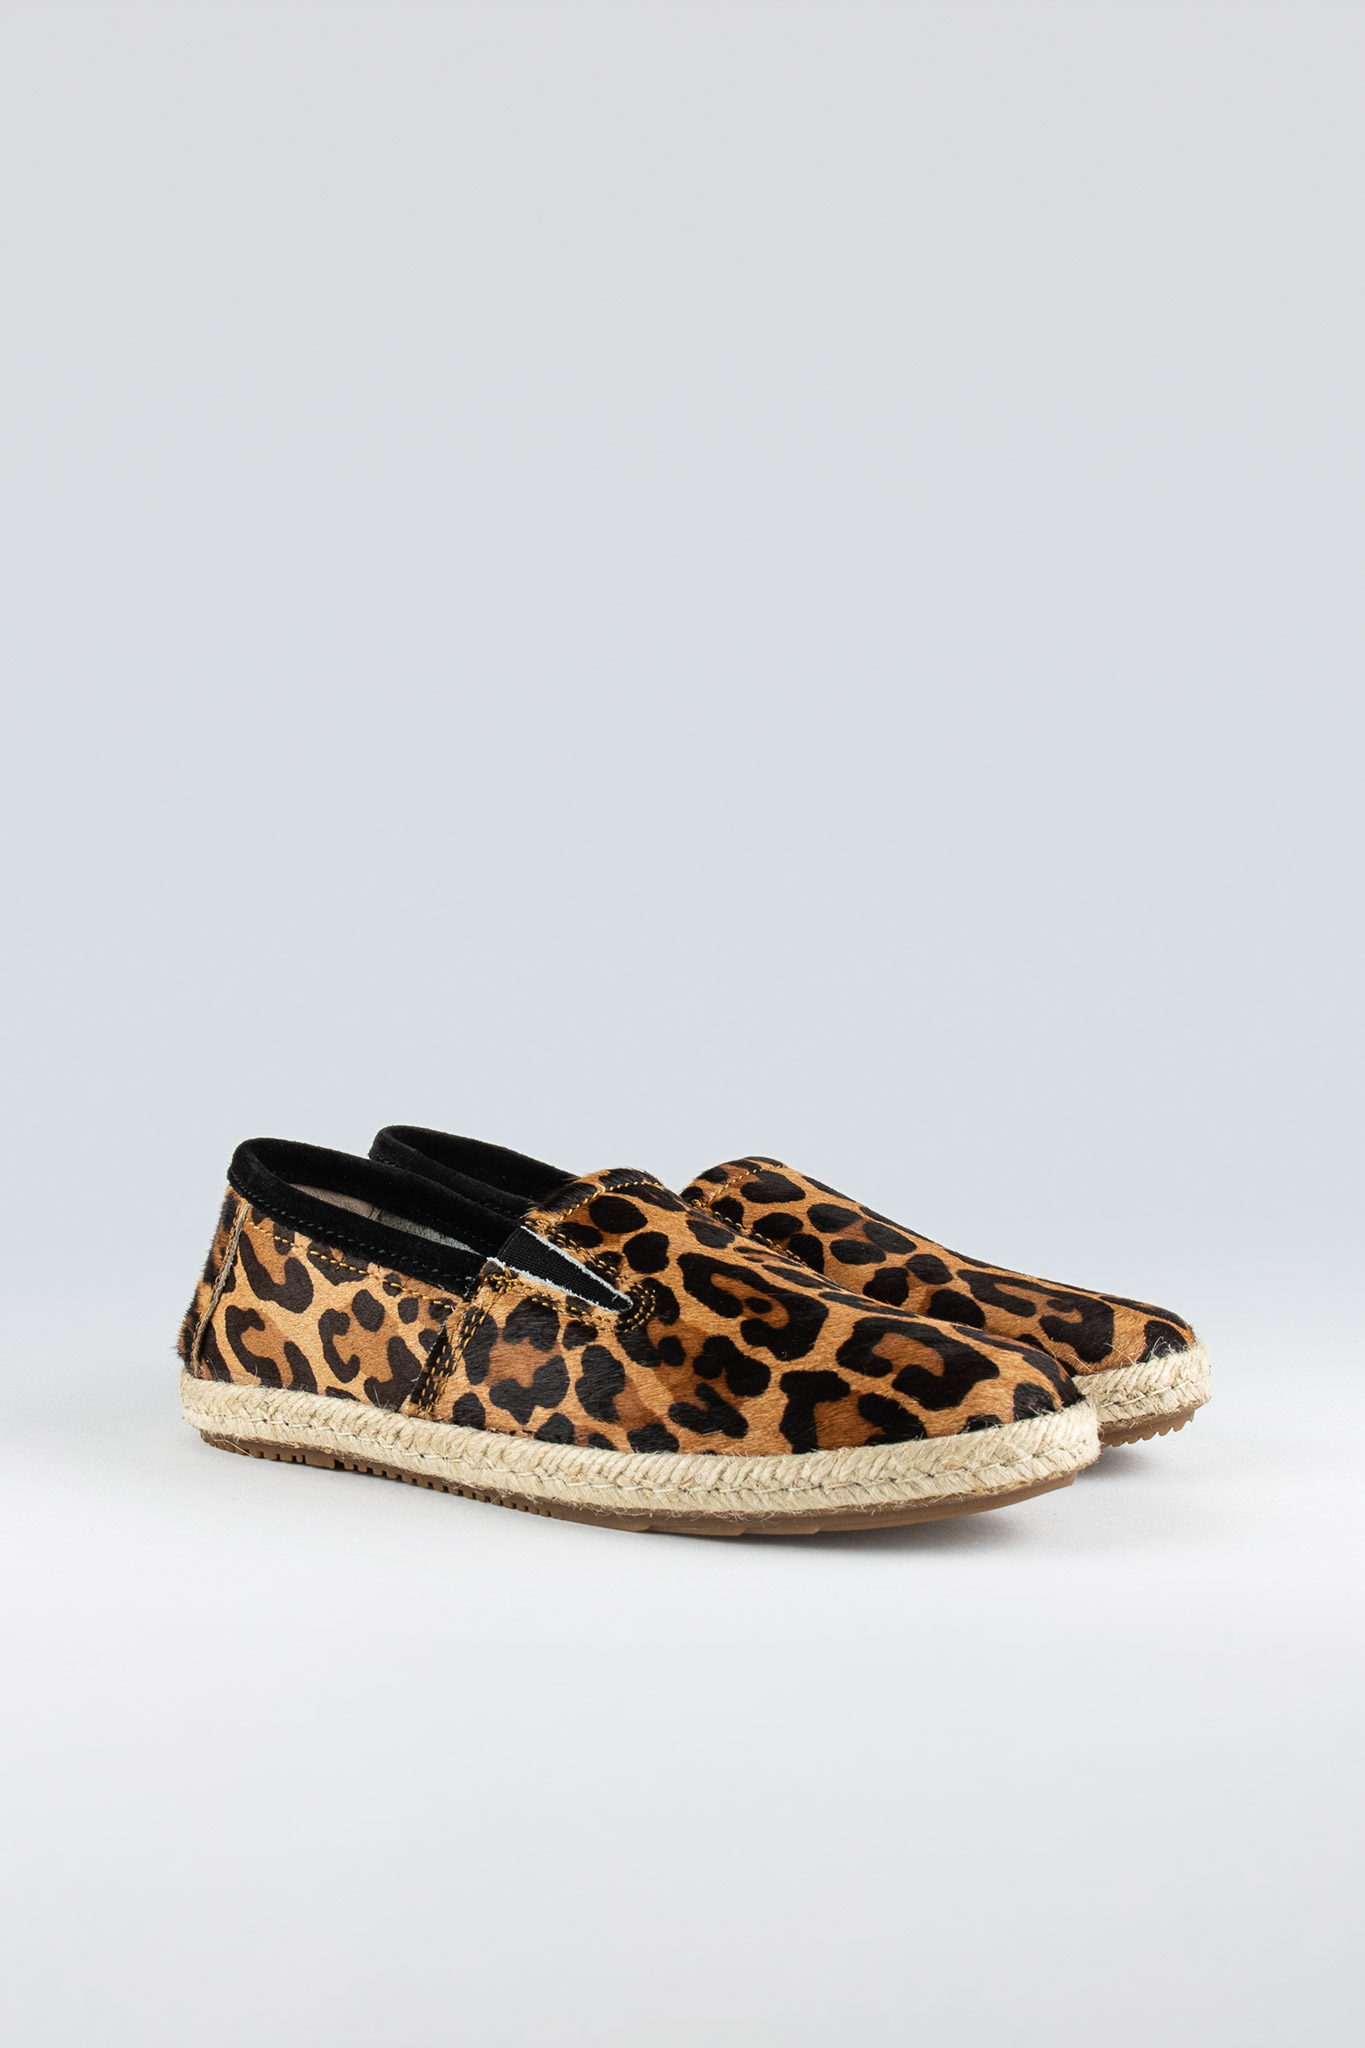 Seal W Pony Hair Caramel Leopard